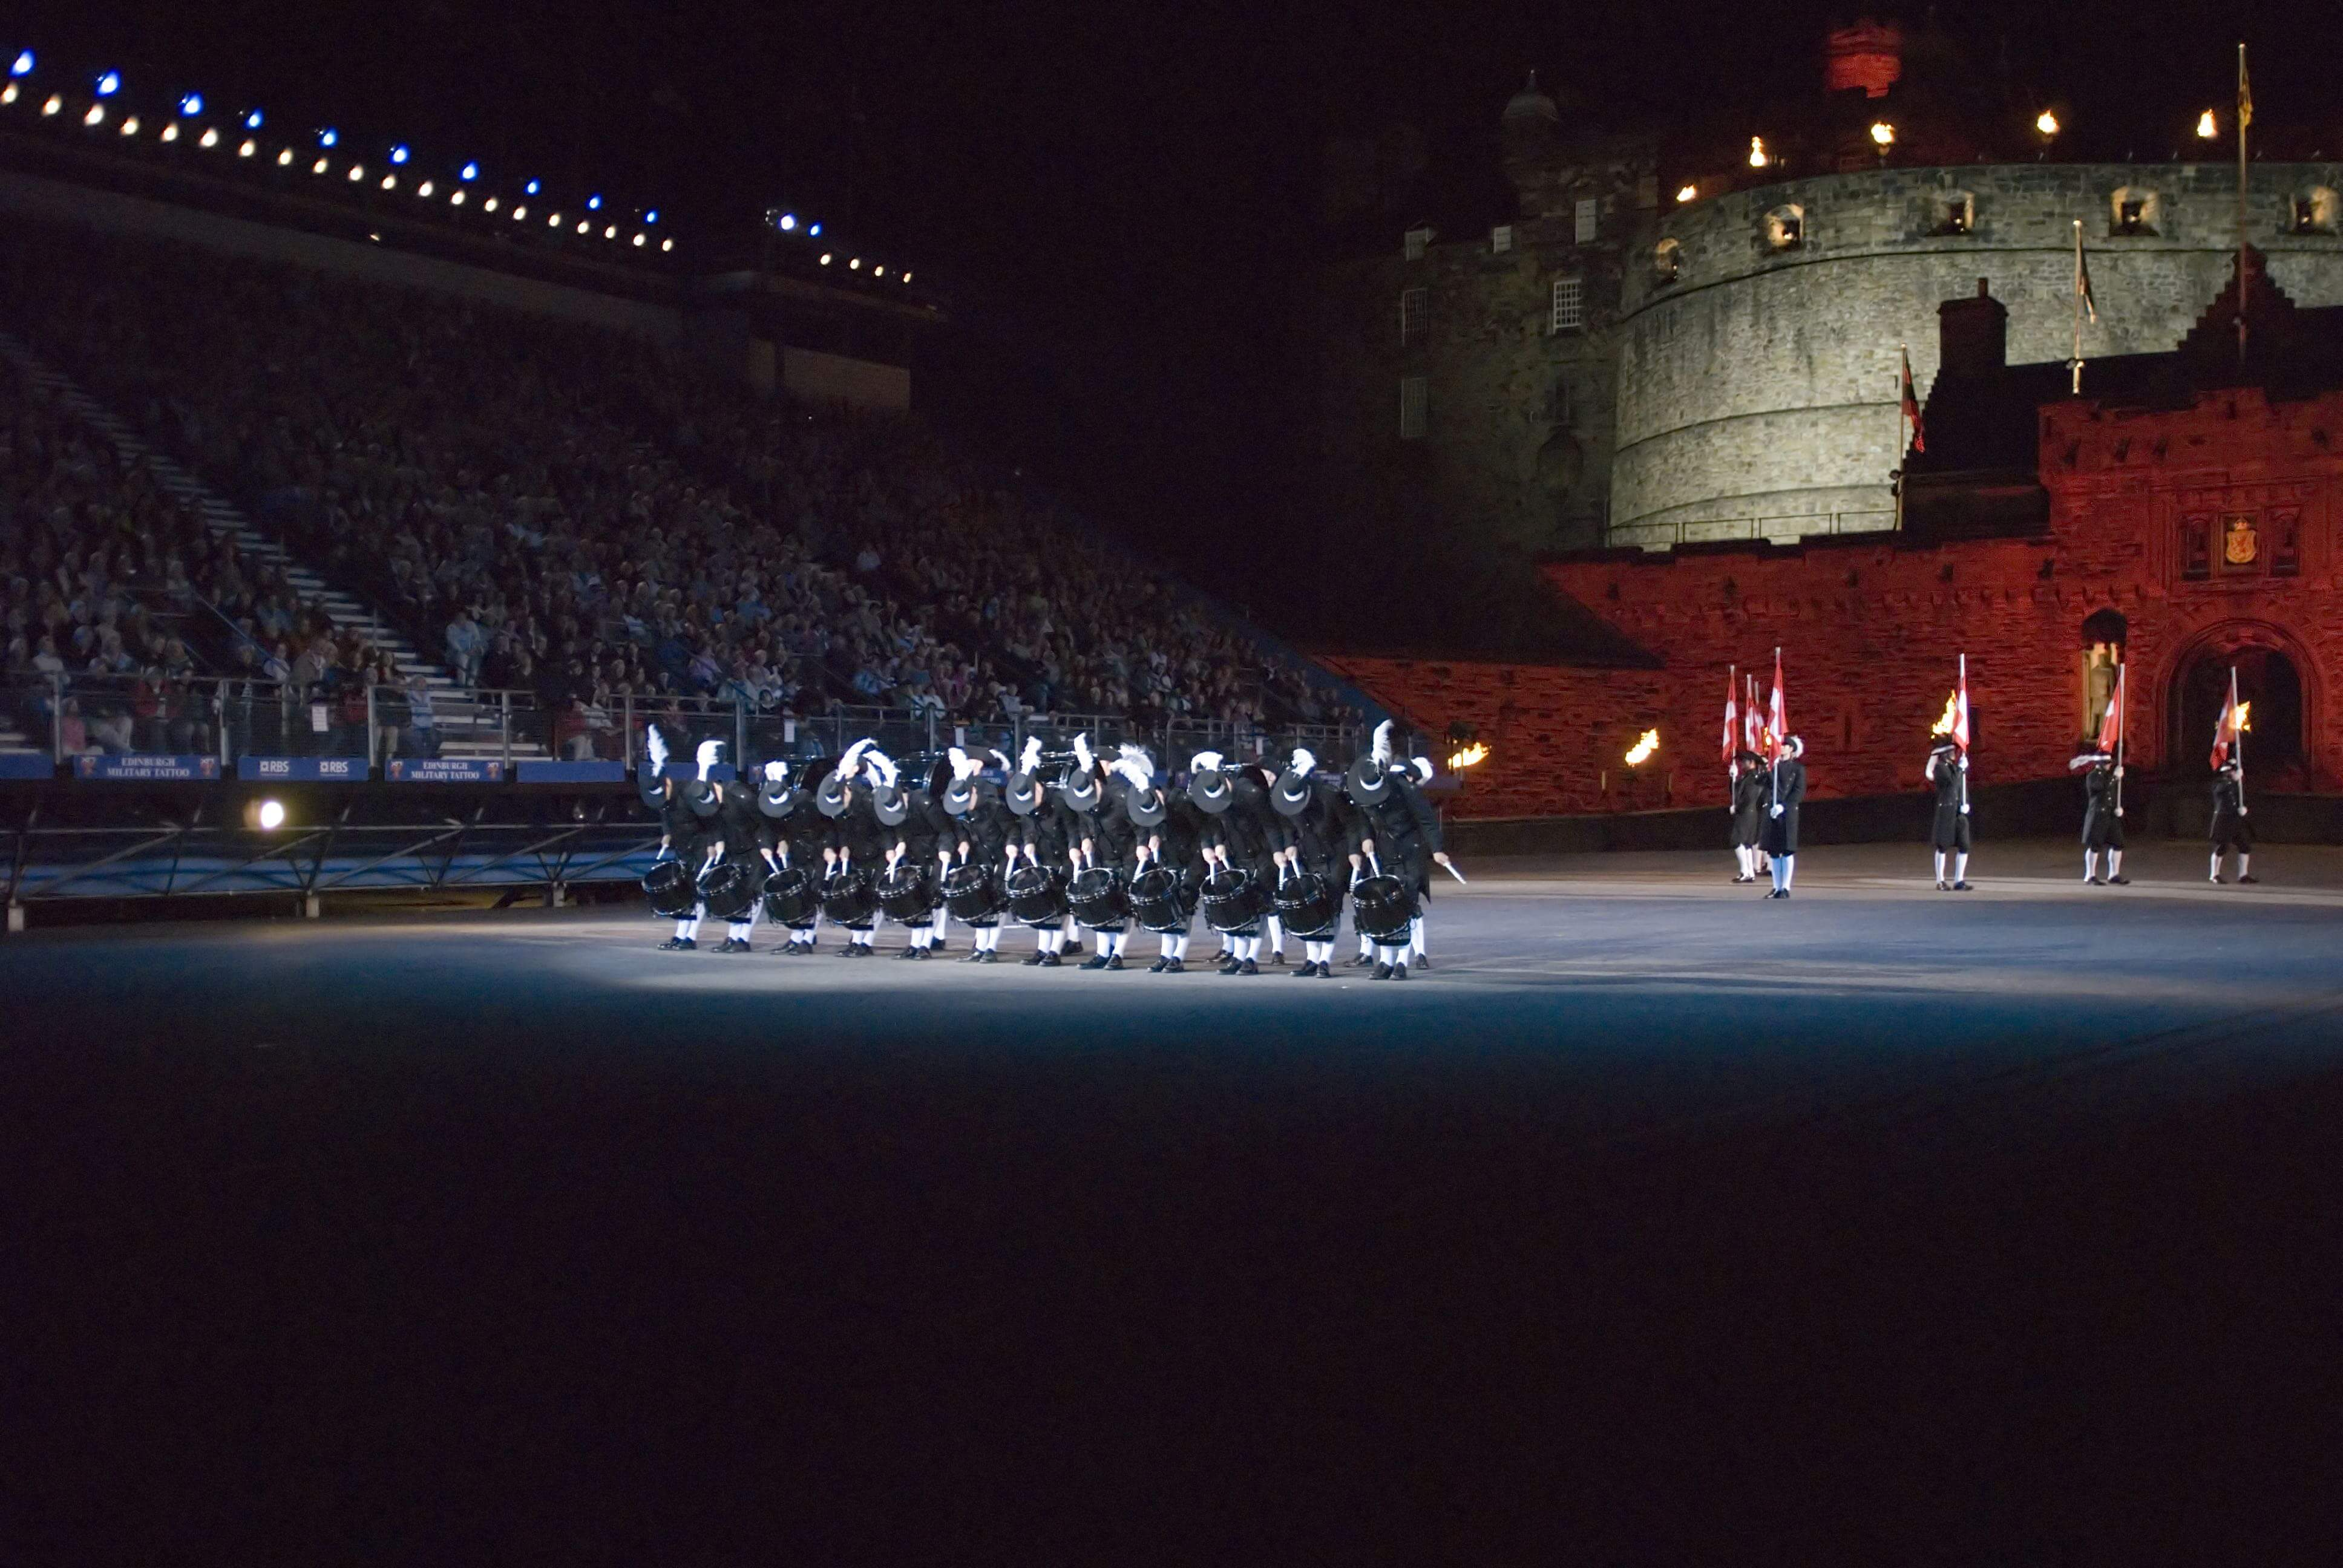 The Top Secret Drum Corps of Switzerland at Edinburgh Military Tattoo.